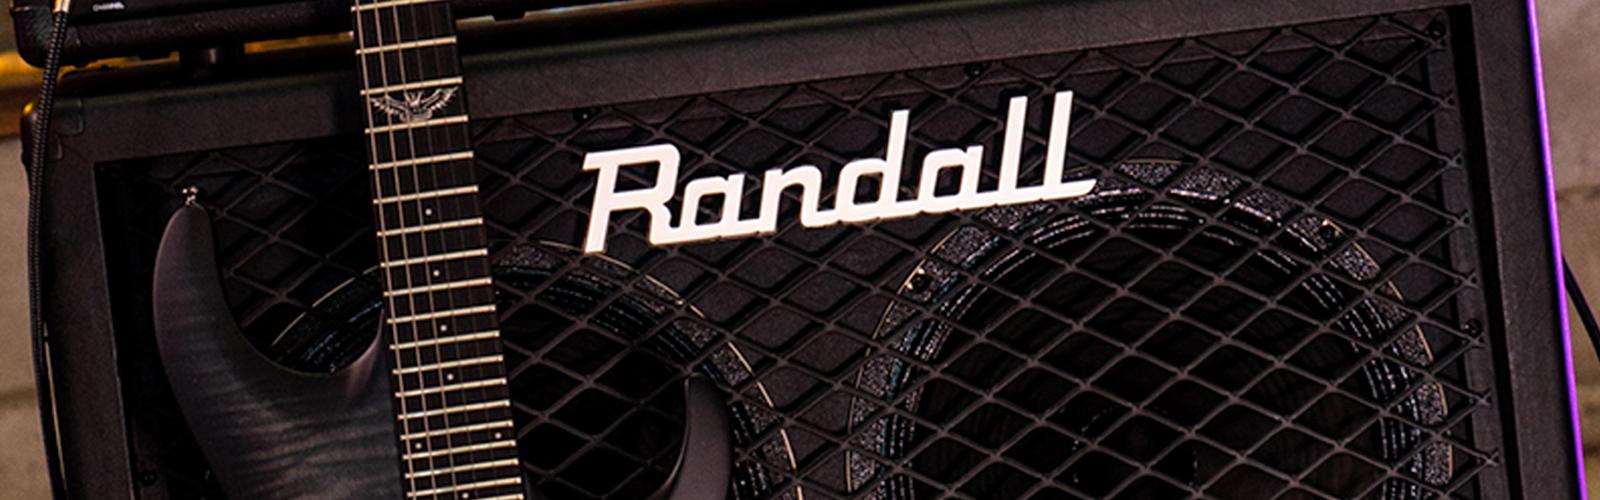 Randall | Washburn image